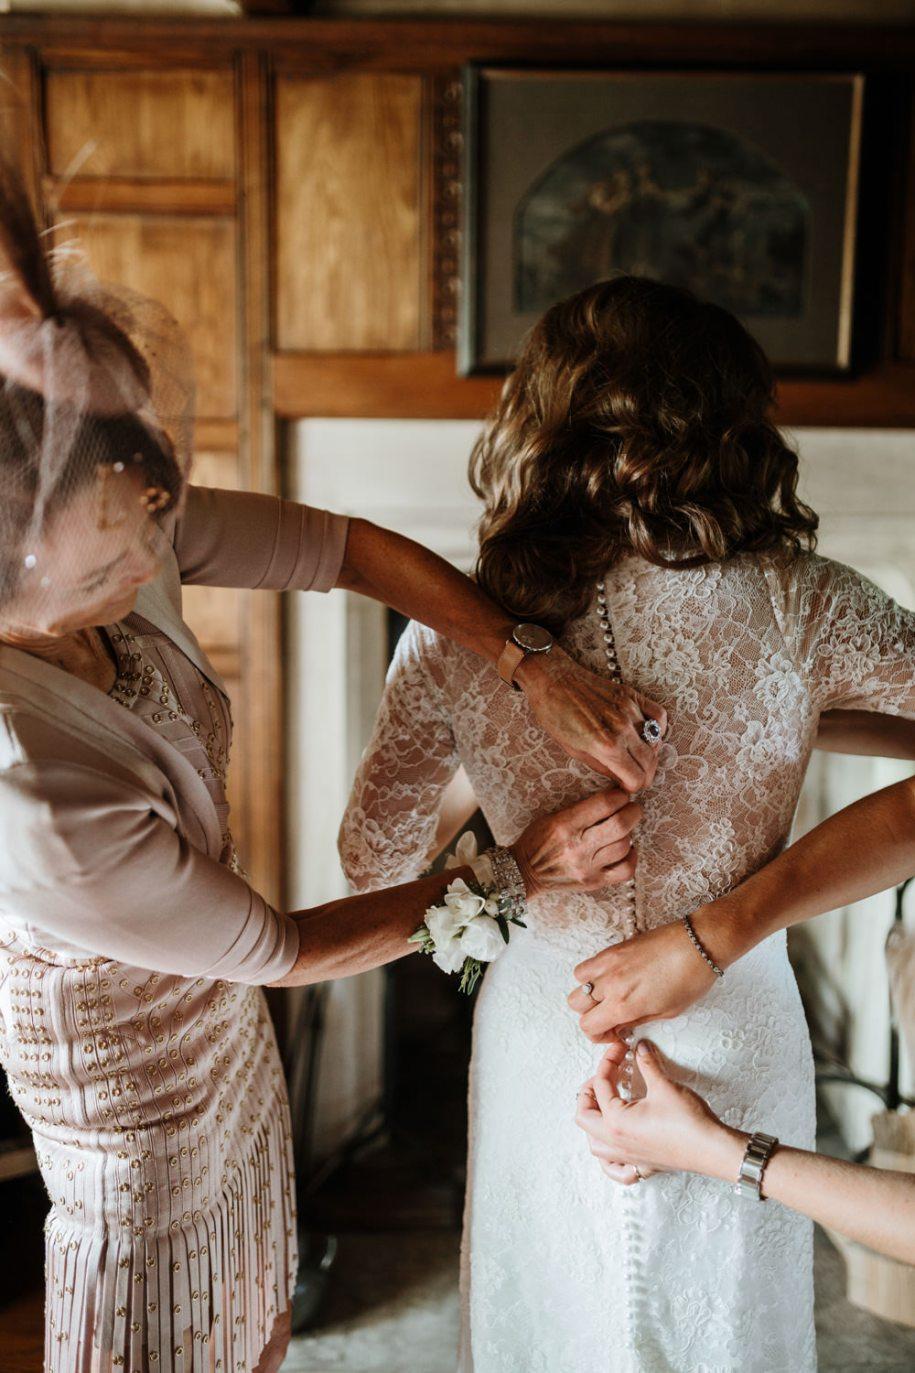 crochet hook for wedding dress wedding planning tips